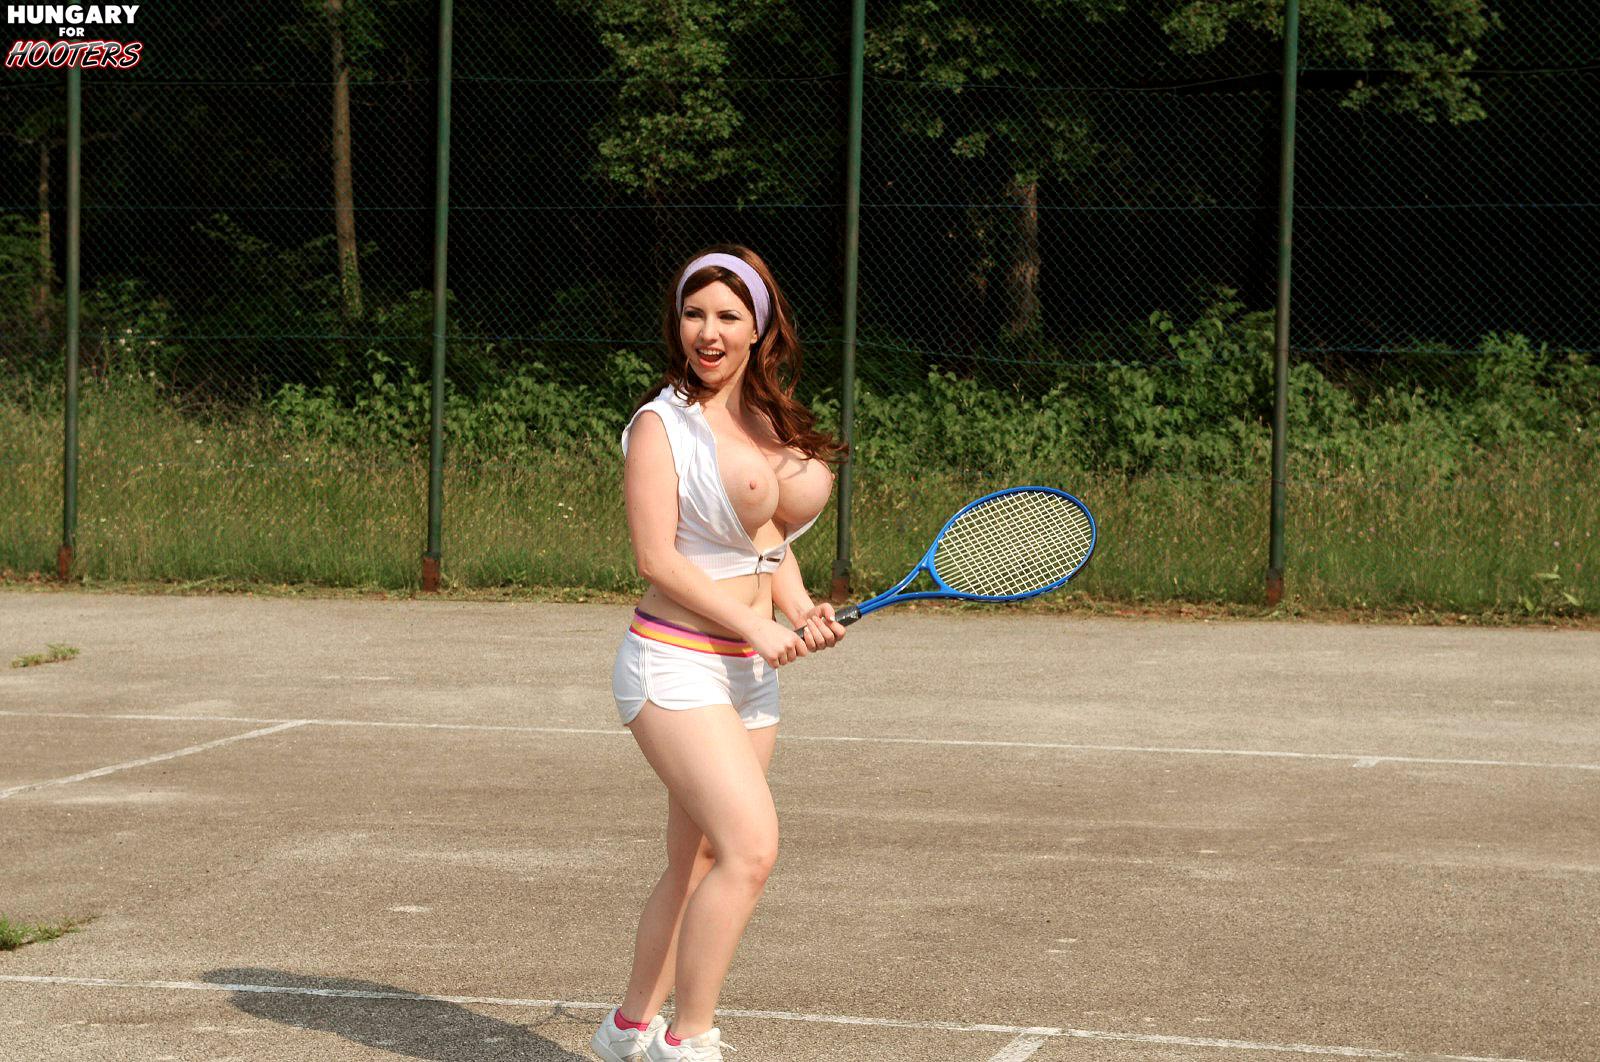 Karina hart busty tennis agree